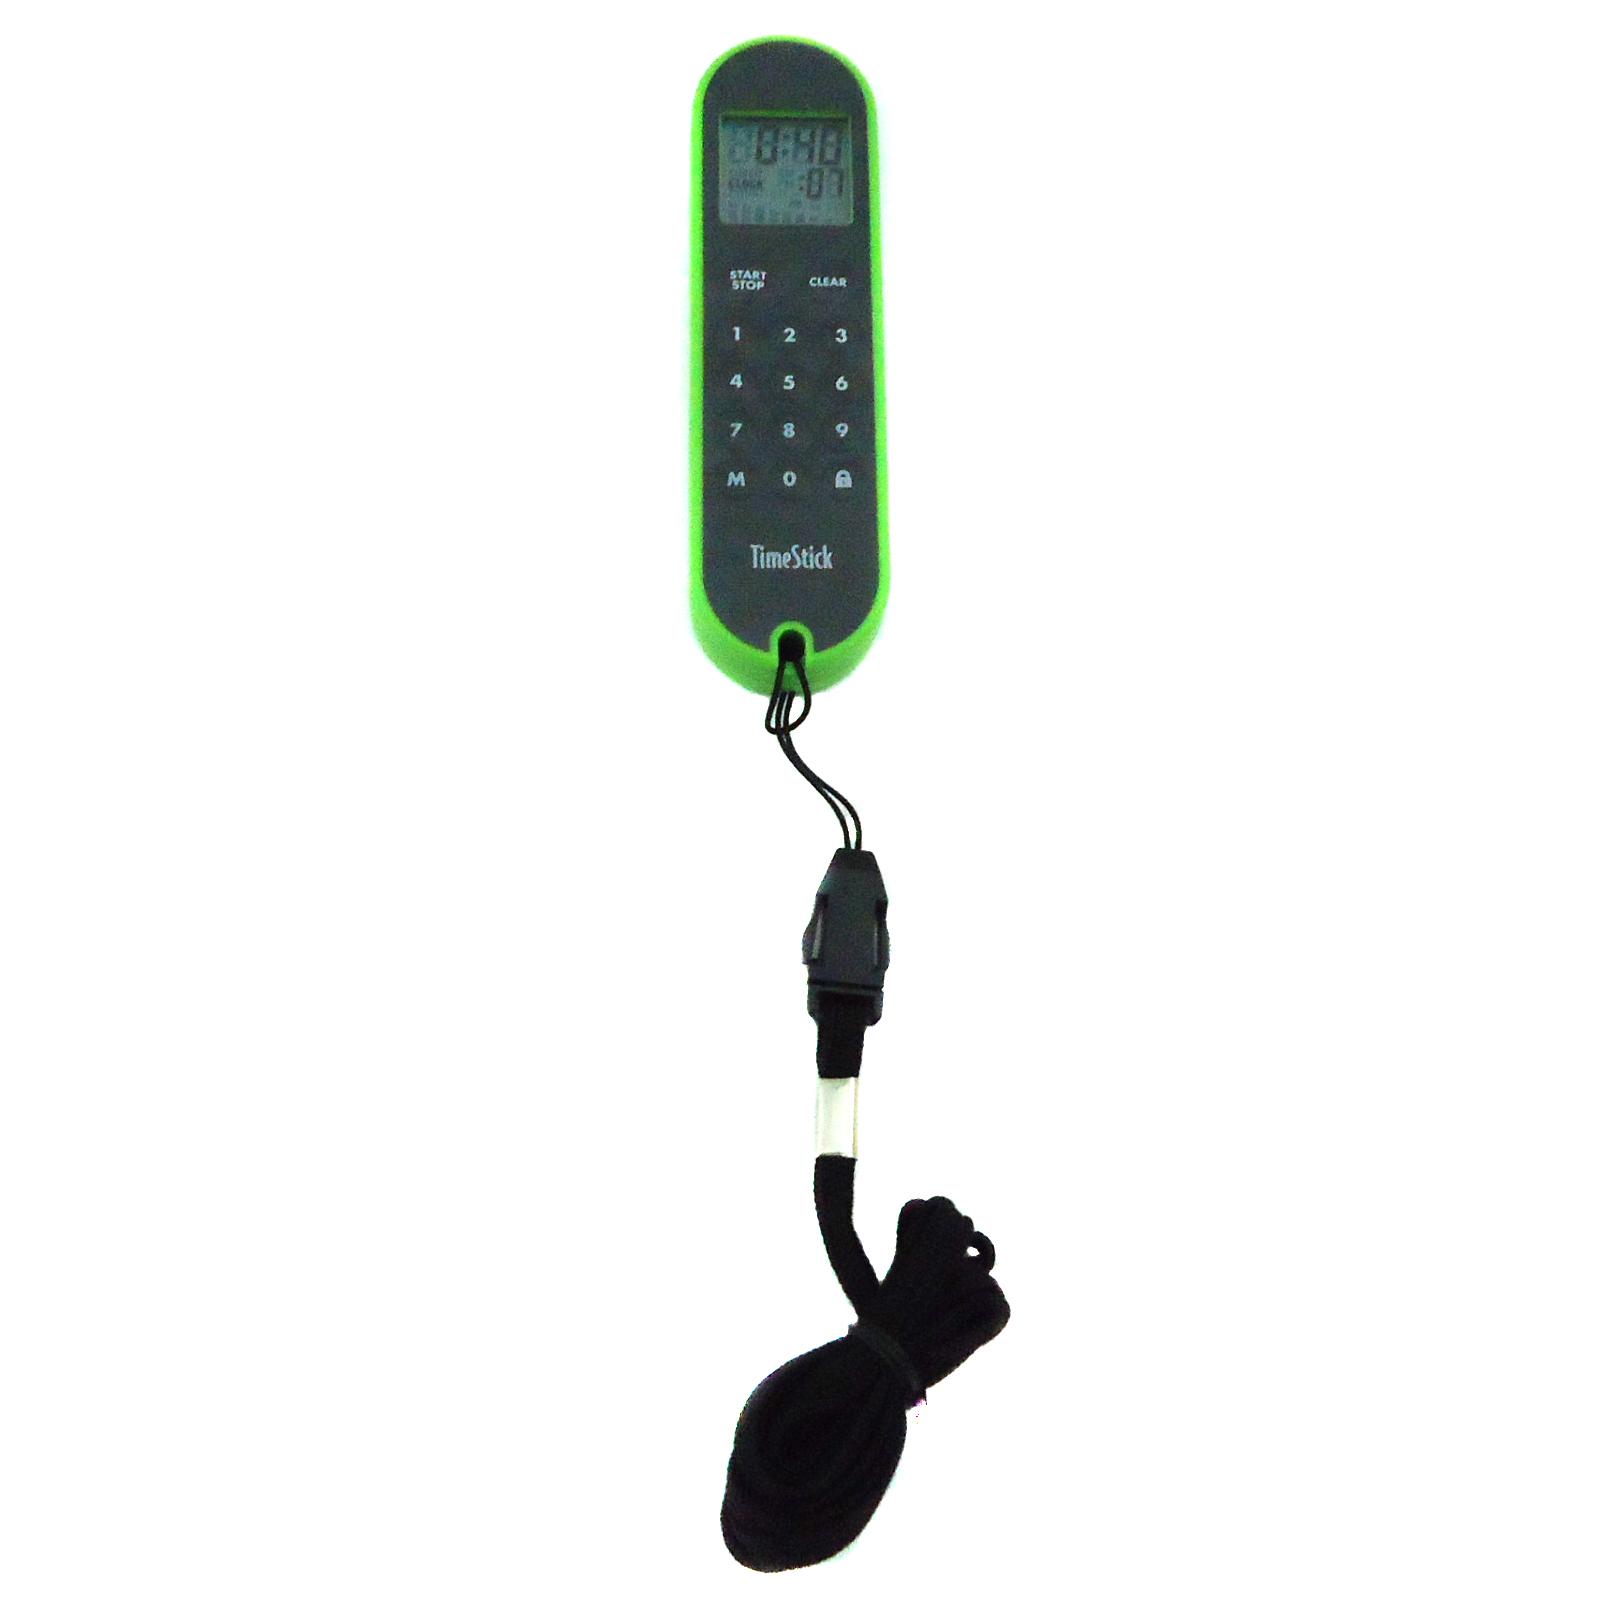 Eti 806-183 TimeStick Αδιάβροχο Χρονόμετρο - Χρώμα: Πράσινο